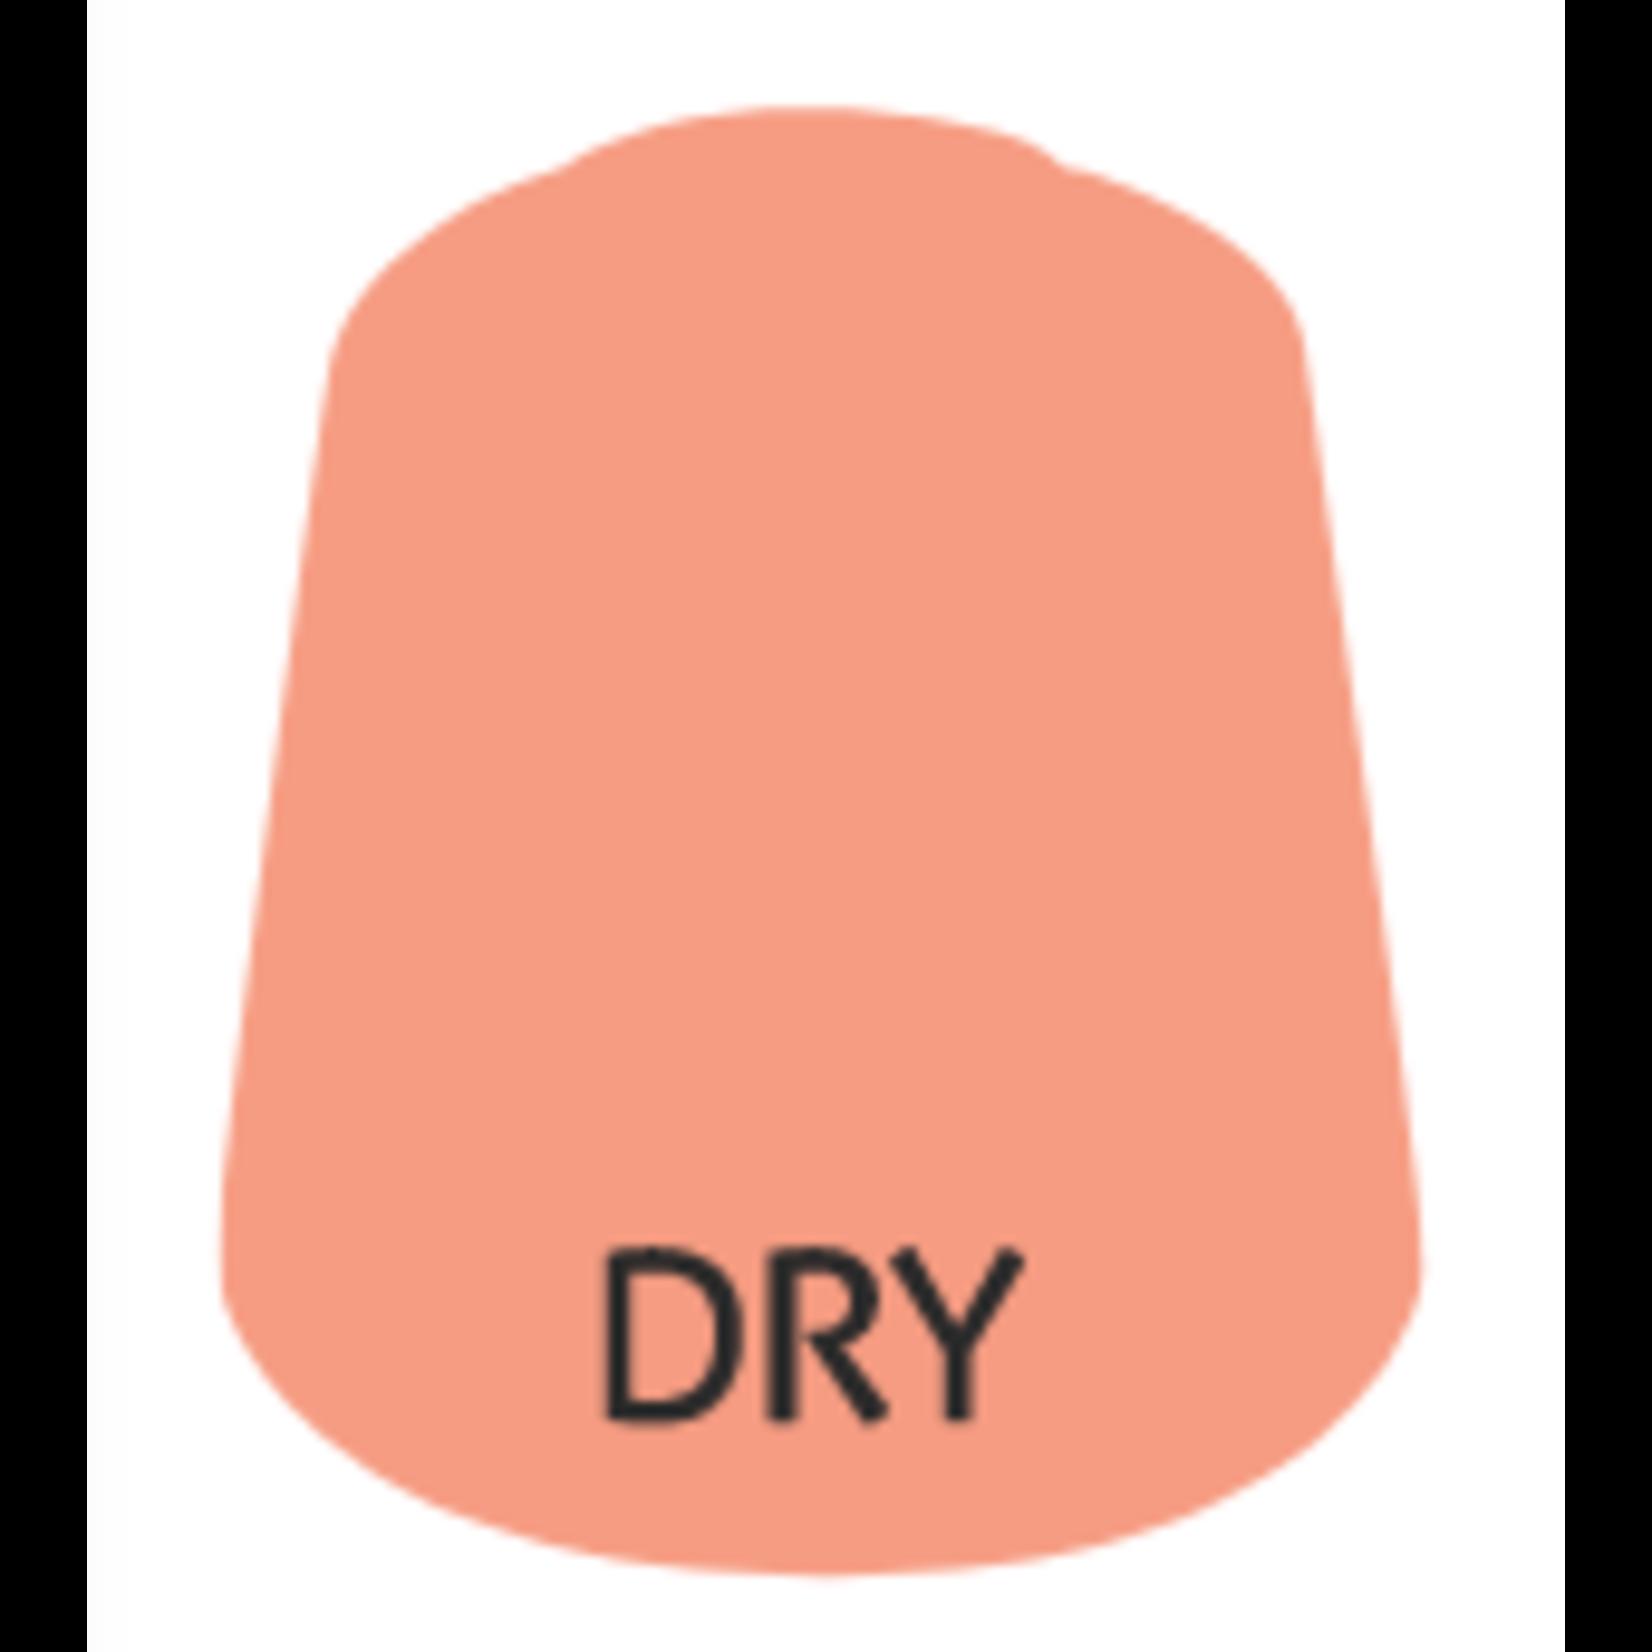 Games Workshop Dry: Kindleflame (12ml) Paint